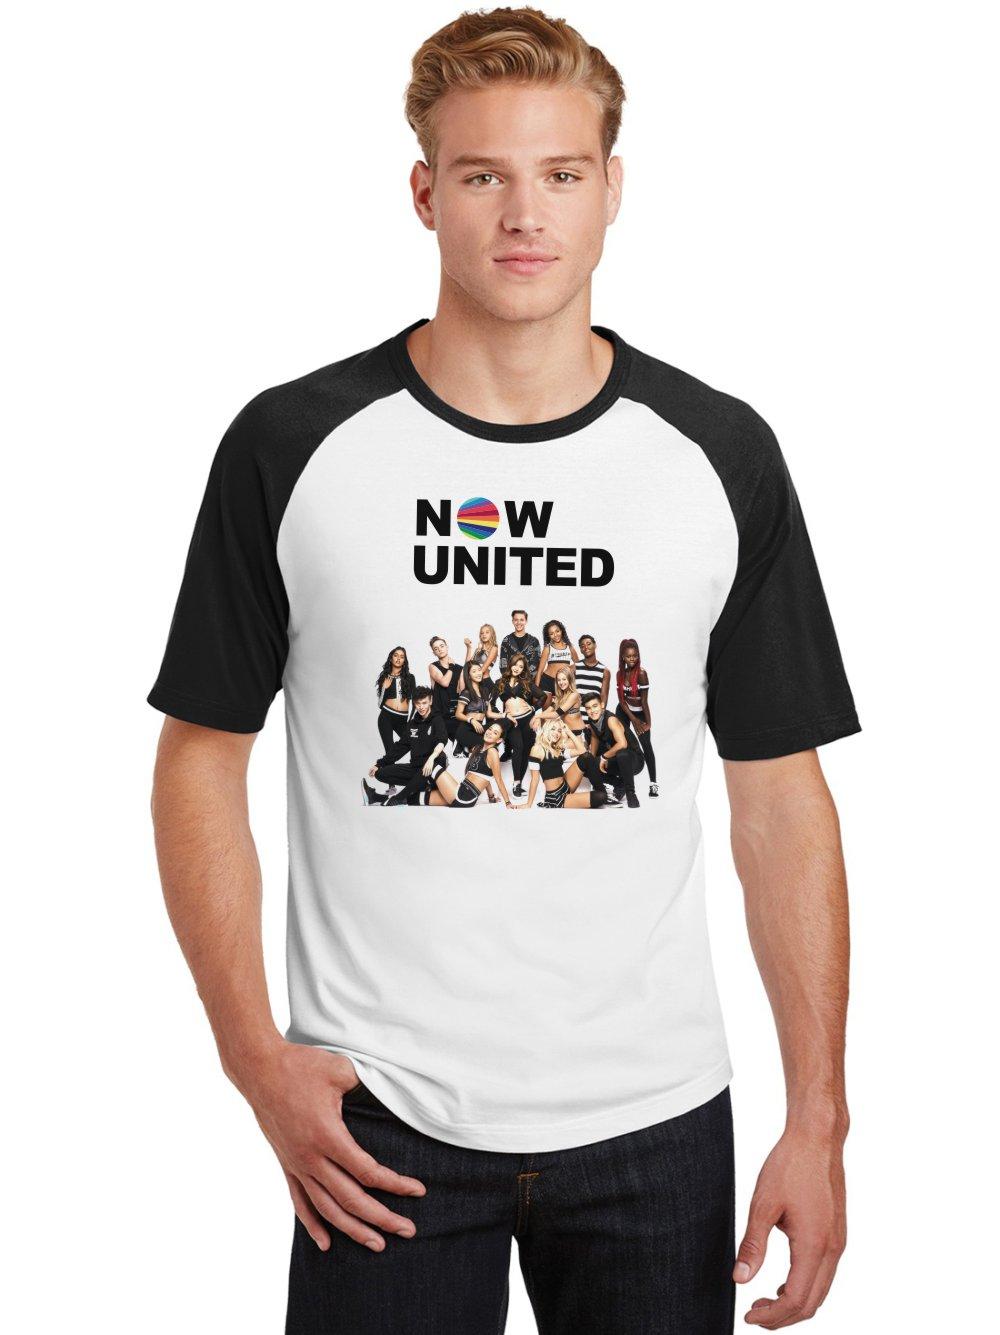 Camiseta Raglan Masculina Banda Now United Integrantes ES_212